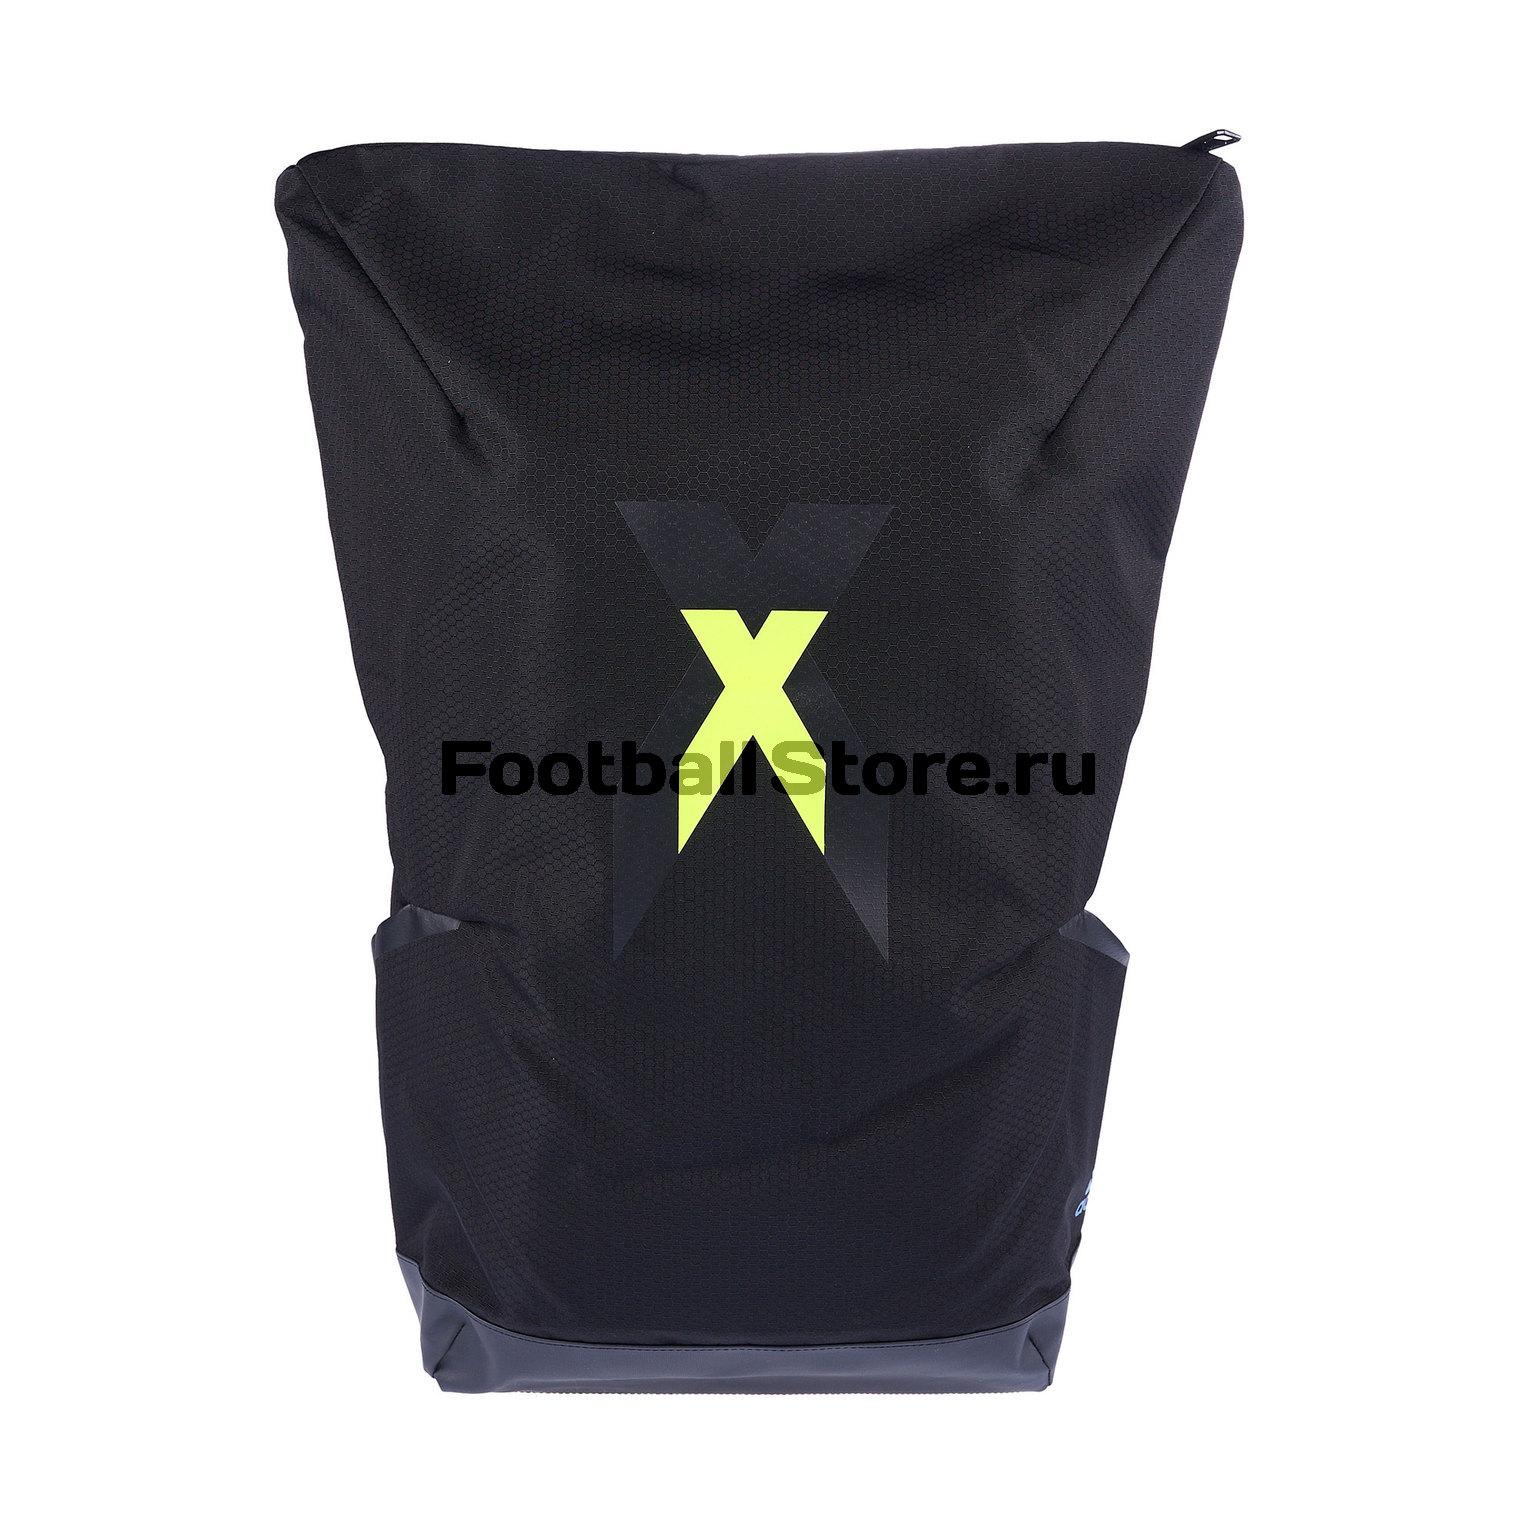 Рюкзак Adidas FI Better DM7174 рюкзак adidas